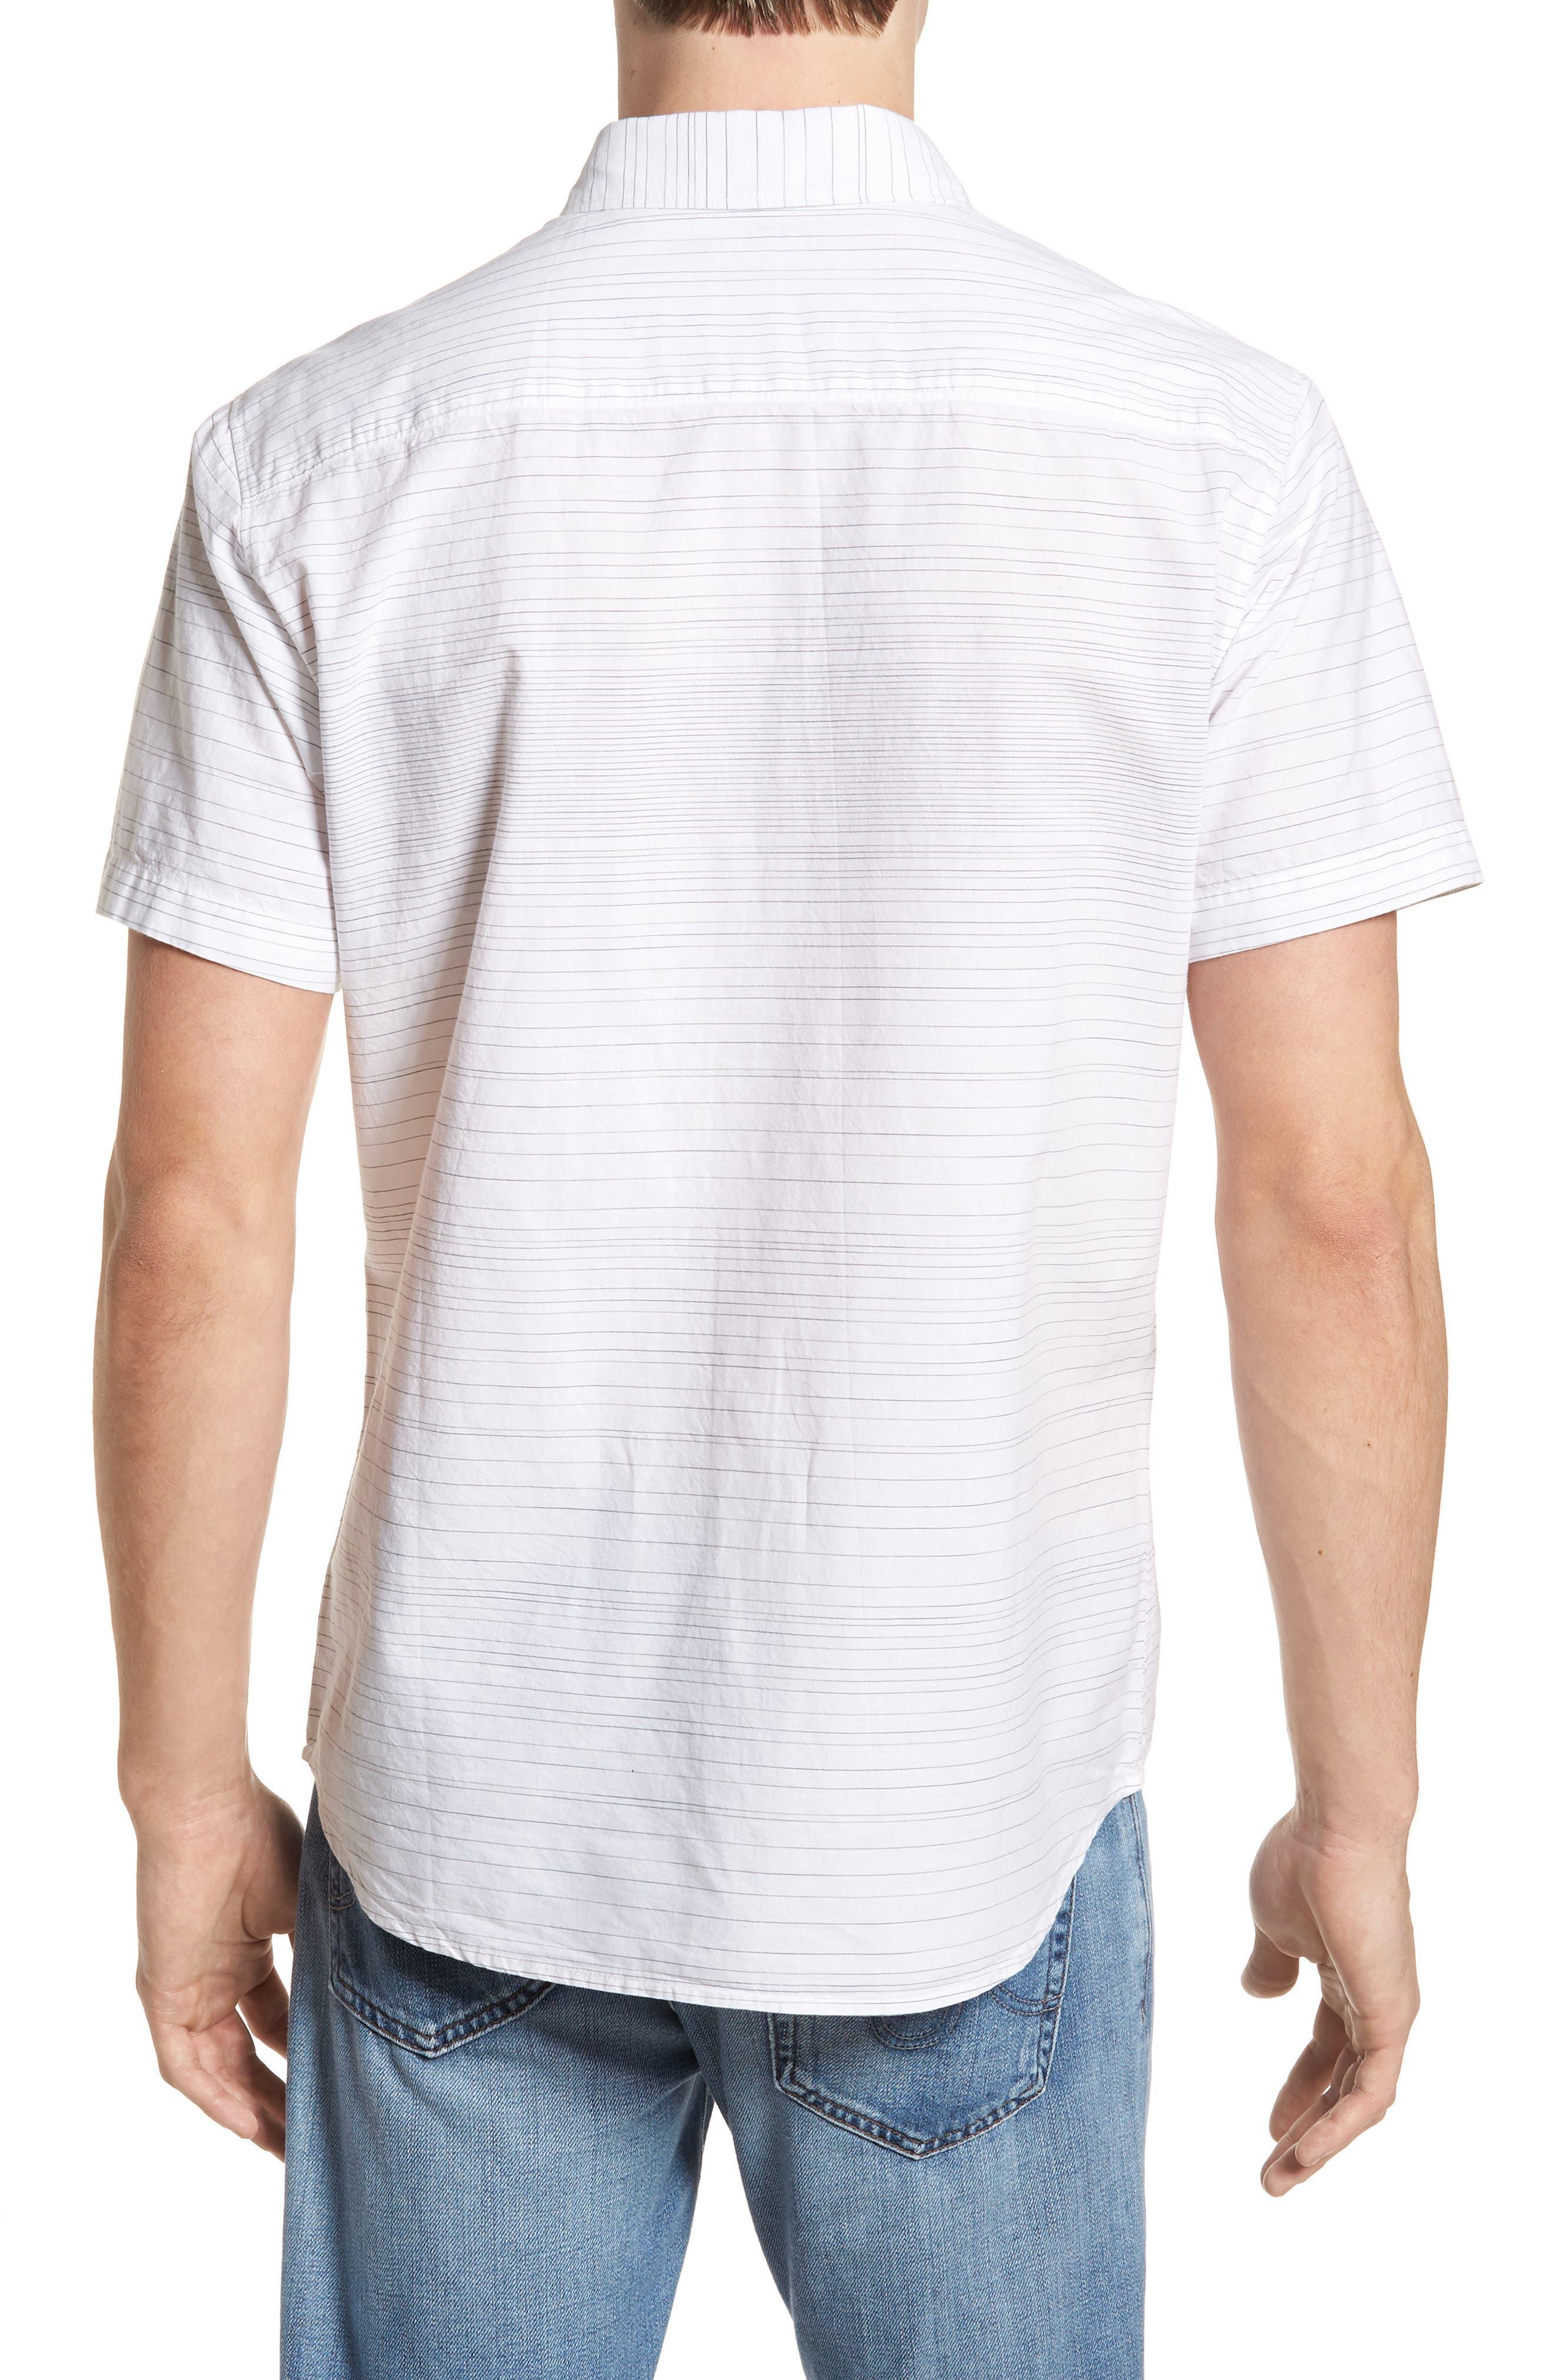 Hound Woven Shirt,                             Alternate thumbnail 2, color,                             White